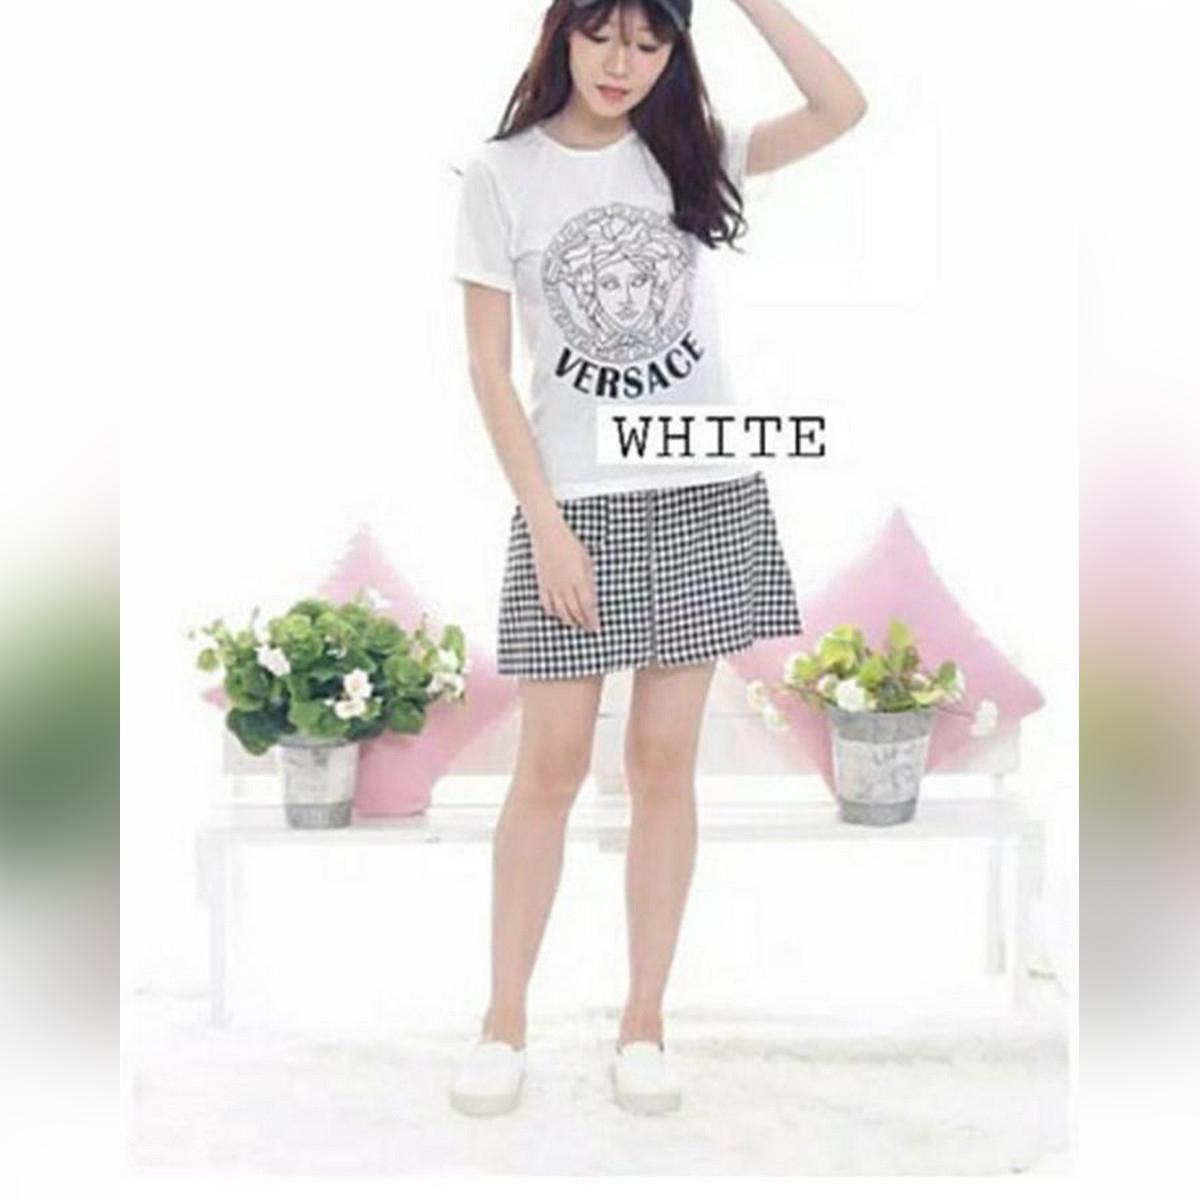 White Versac T-shirt For Her